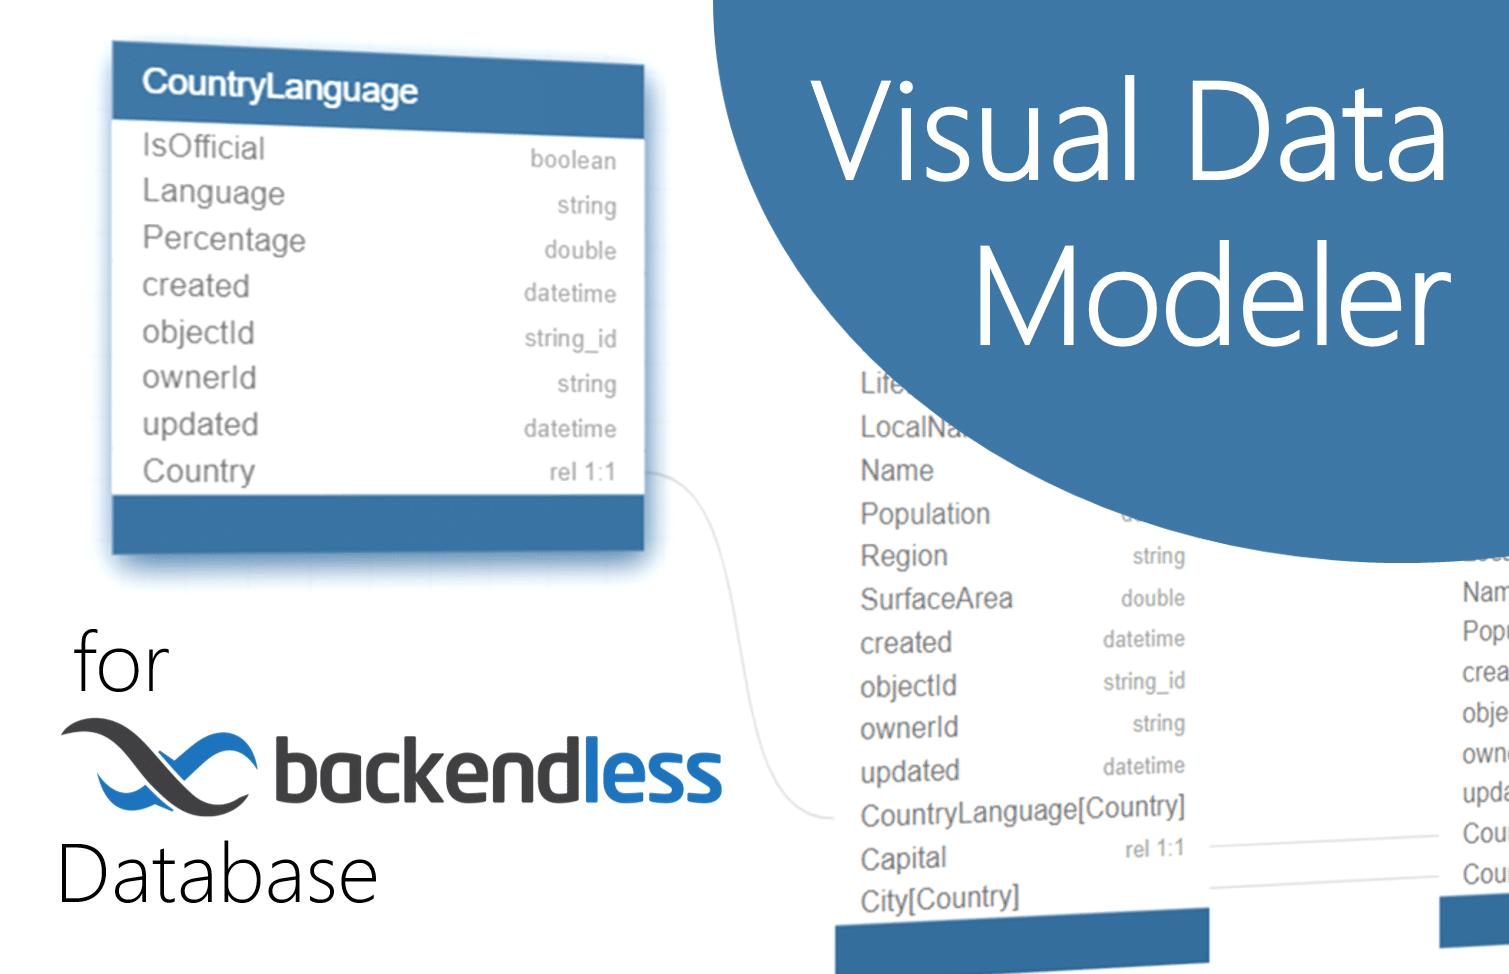 Backendless Visual Data Modeler